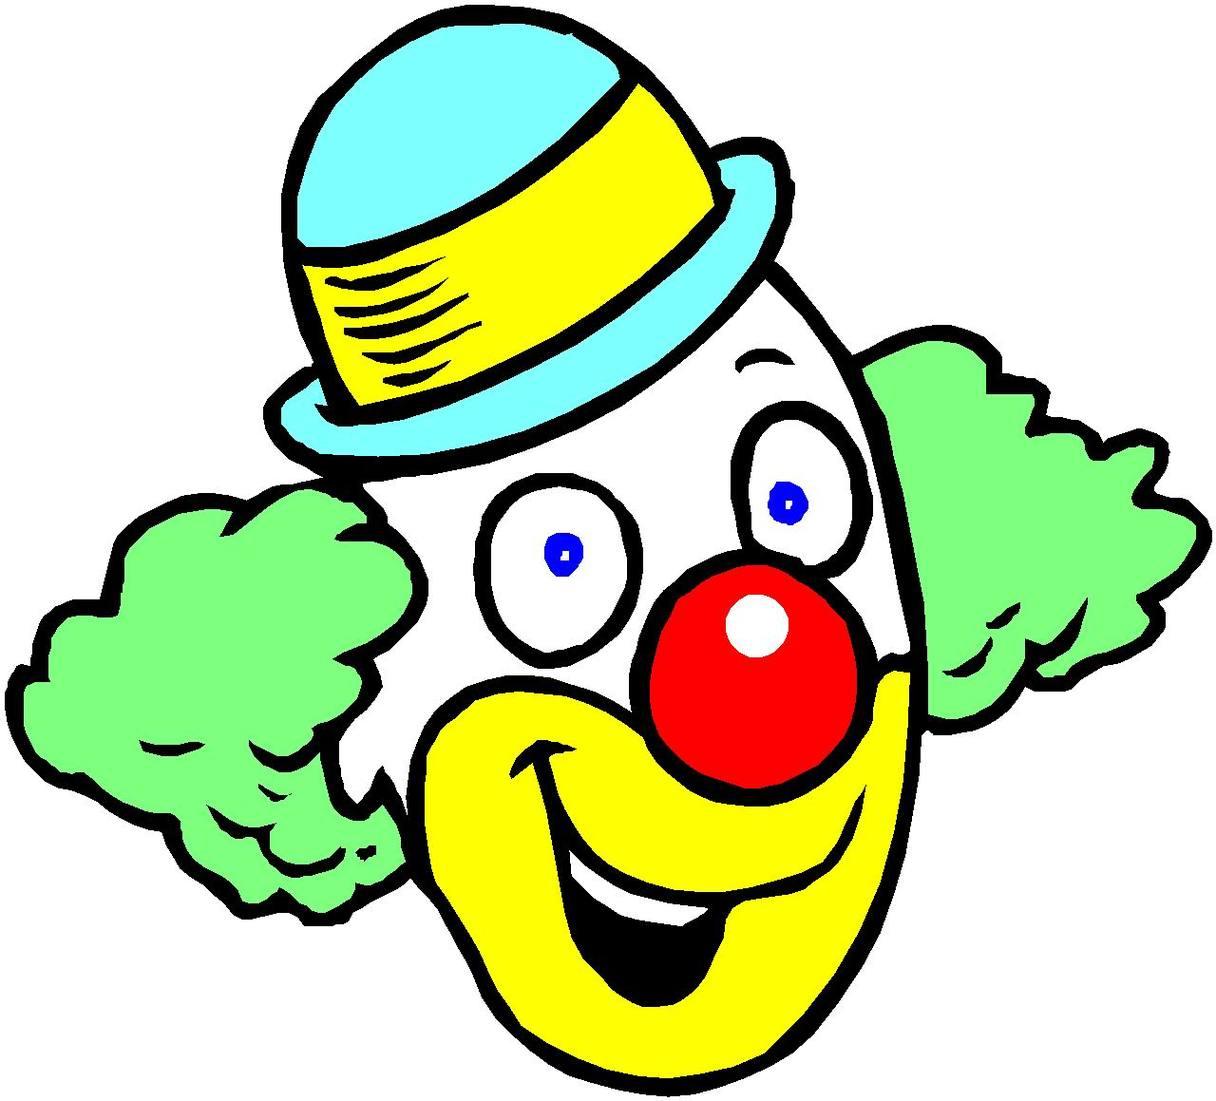 Clown head clipart image freeuse Free Halloween Clown Cliparts, Download Free Clip Art, Free Clip Art ... image freeuse